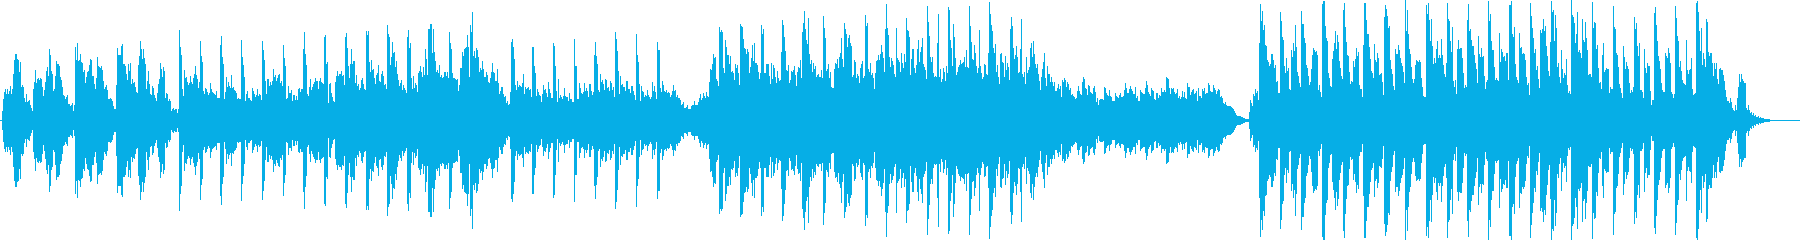 PV】陰鬱、不気味、怖いBGMの再生済みの波形